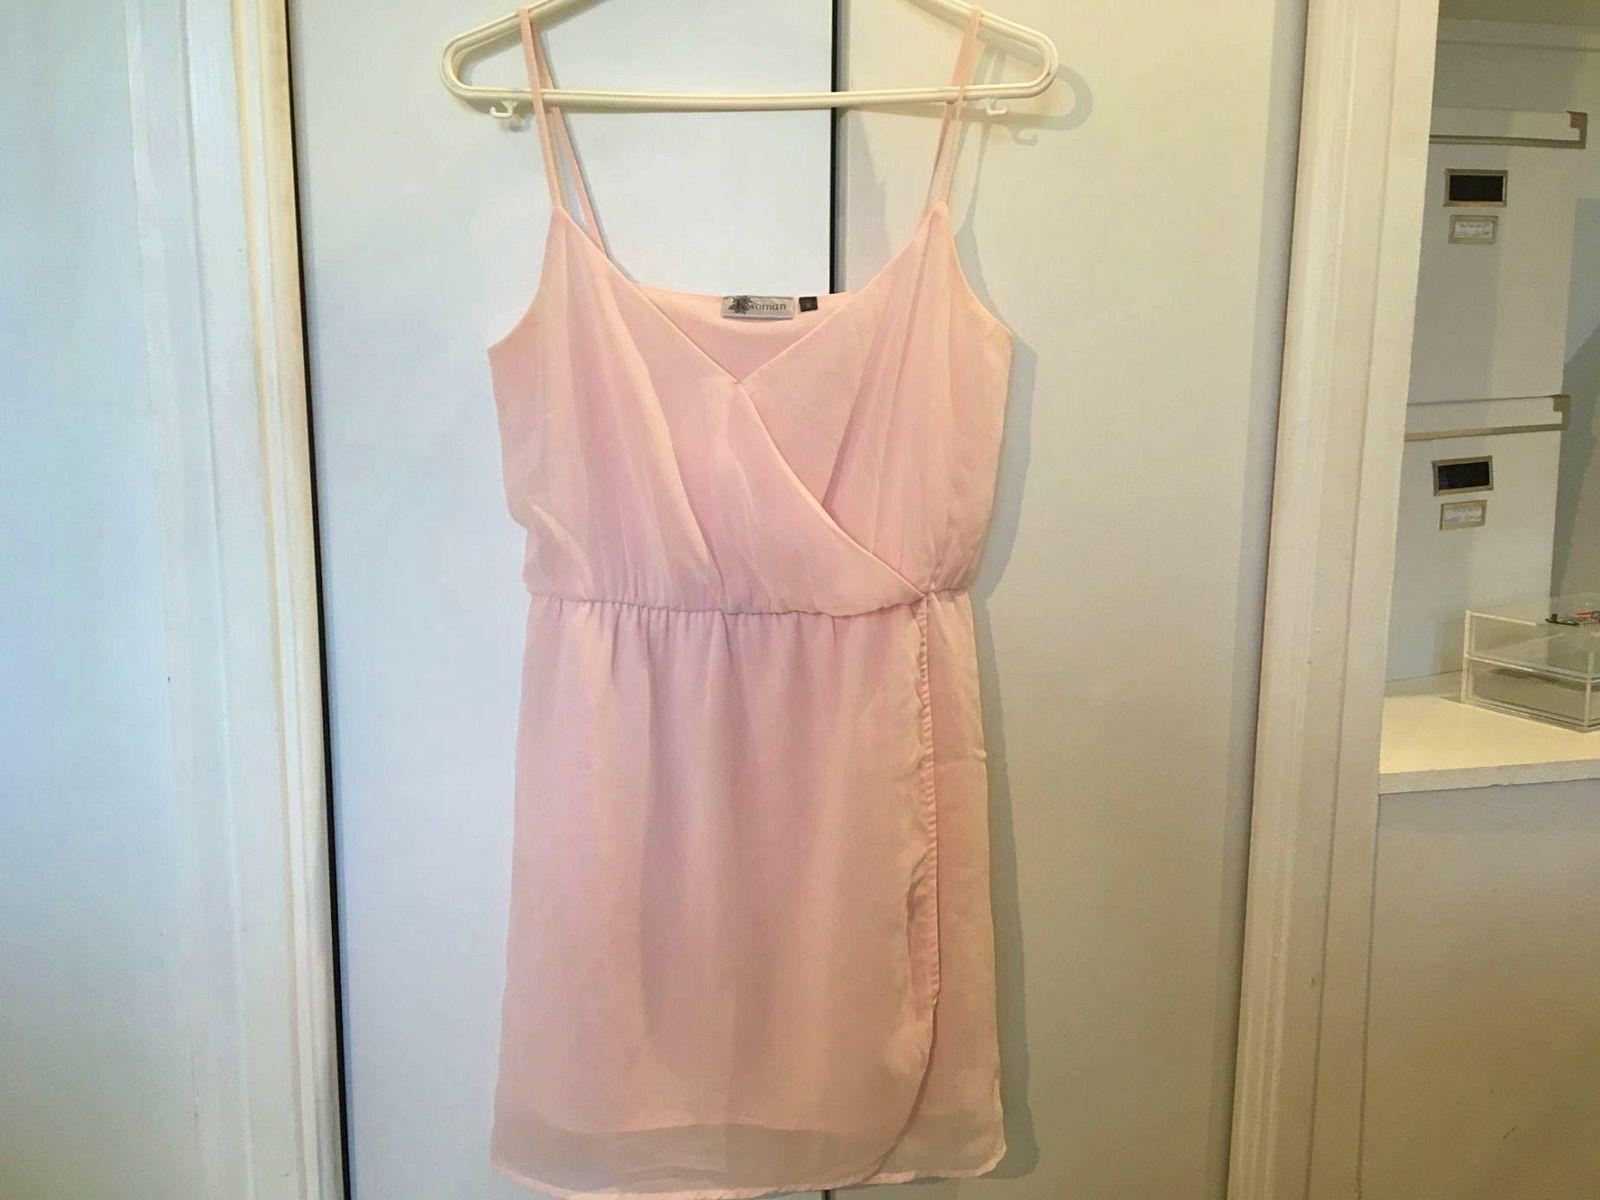 Vends robe estivale rose pâle - Taille XS